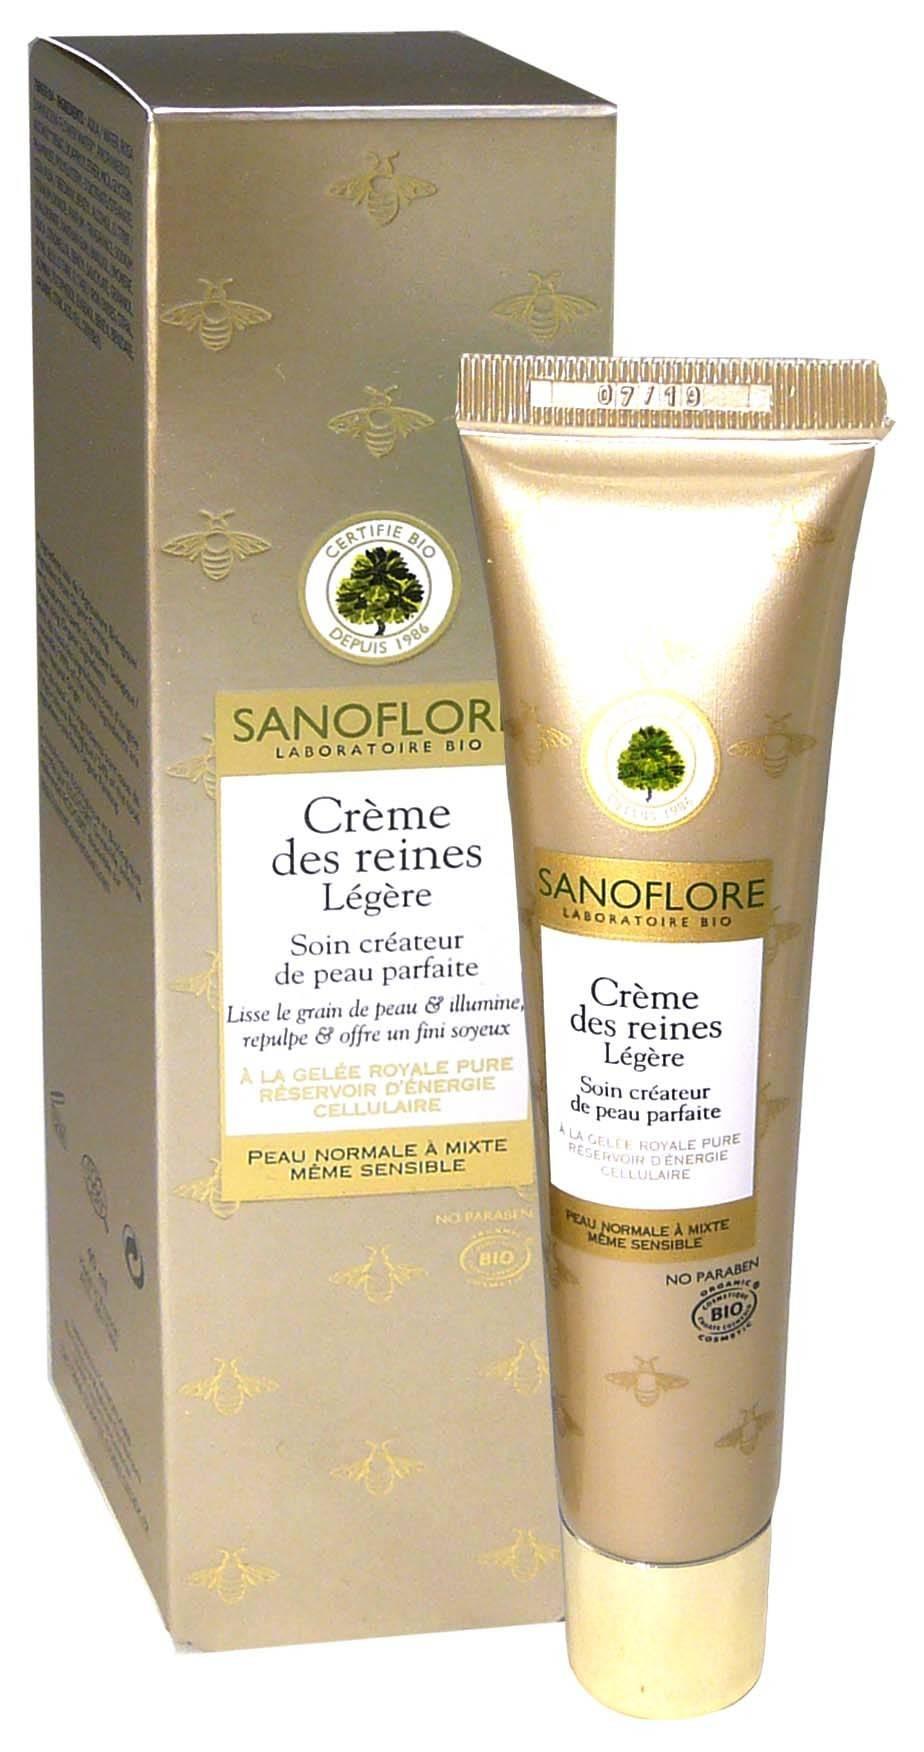 Sanoflore creme des reines legere 40ml